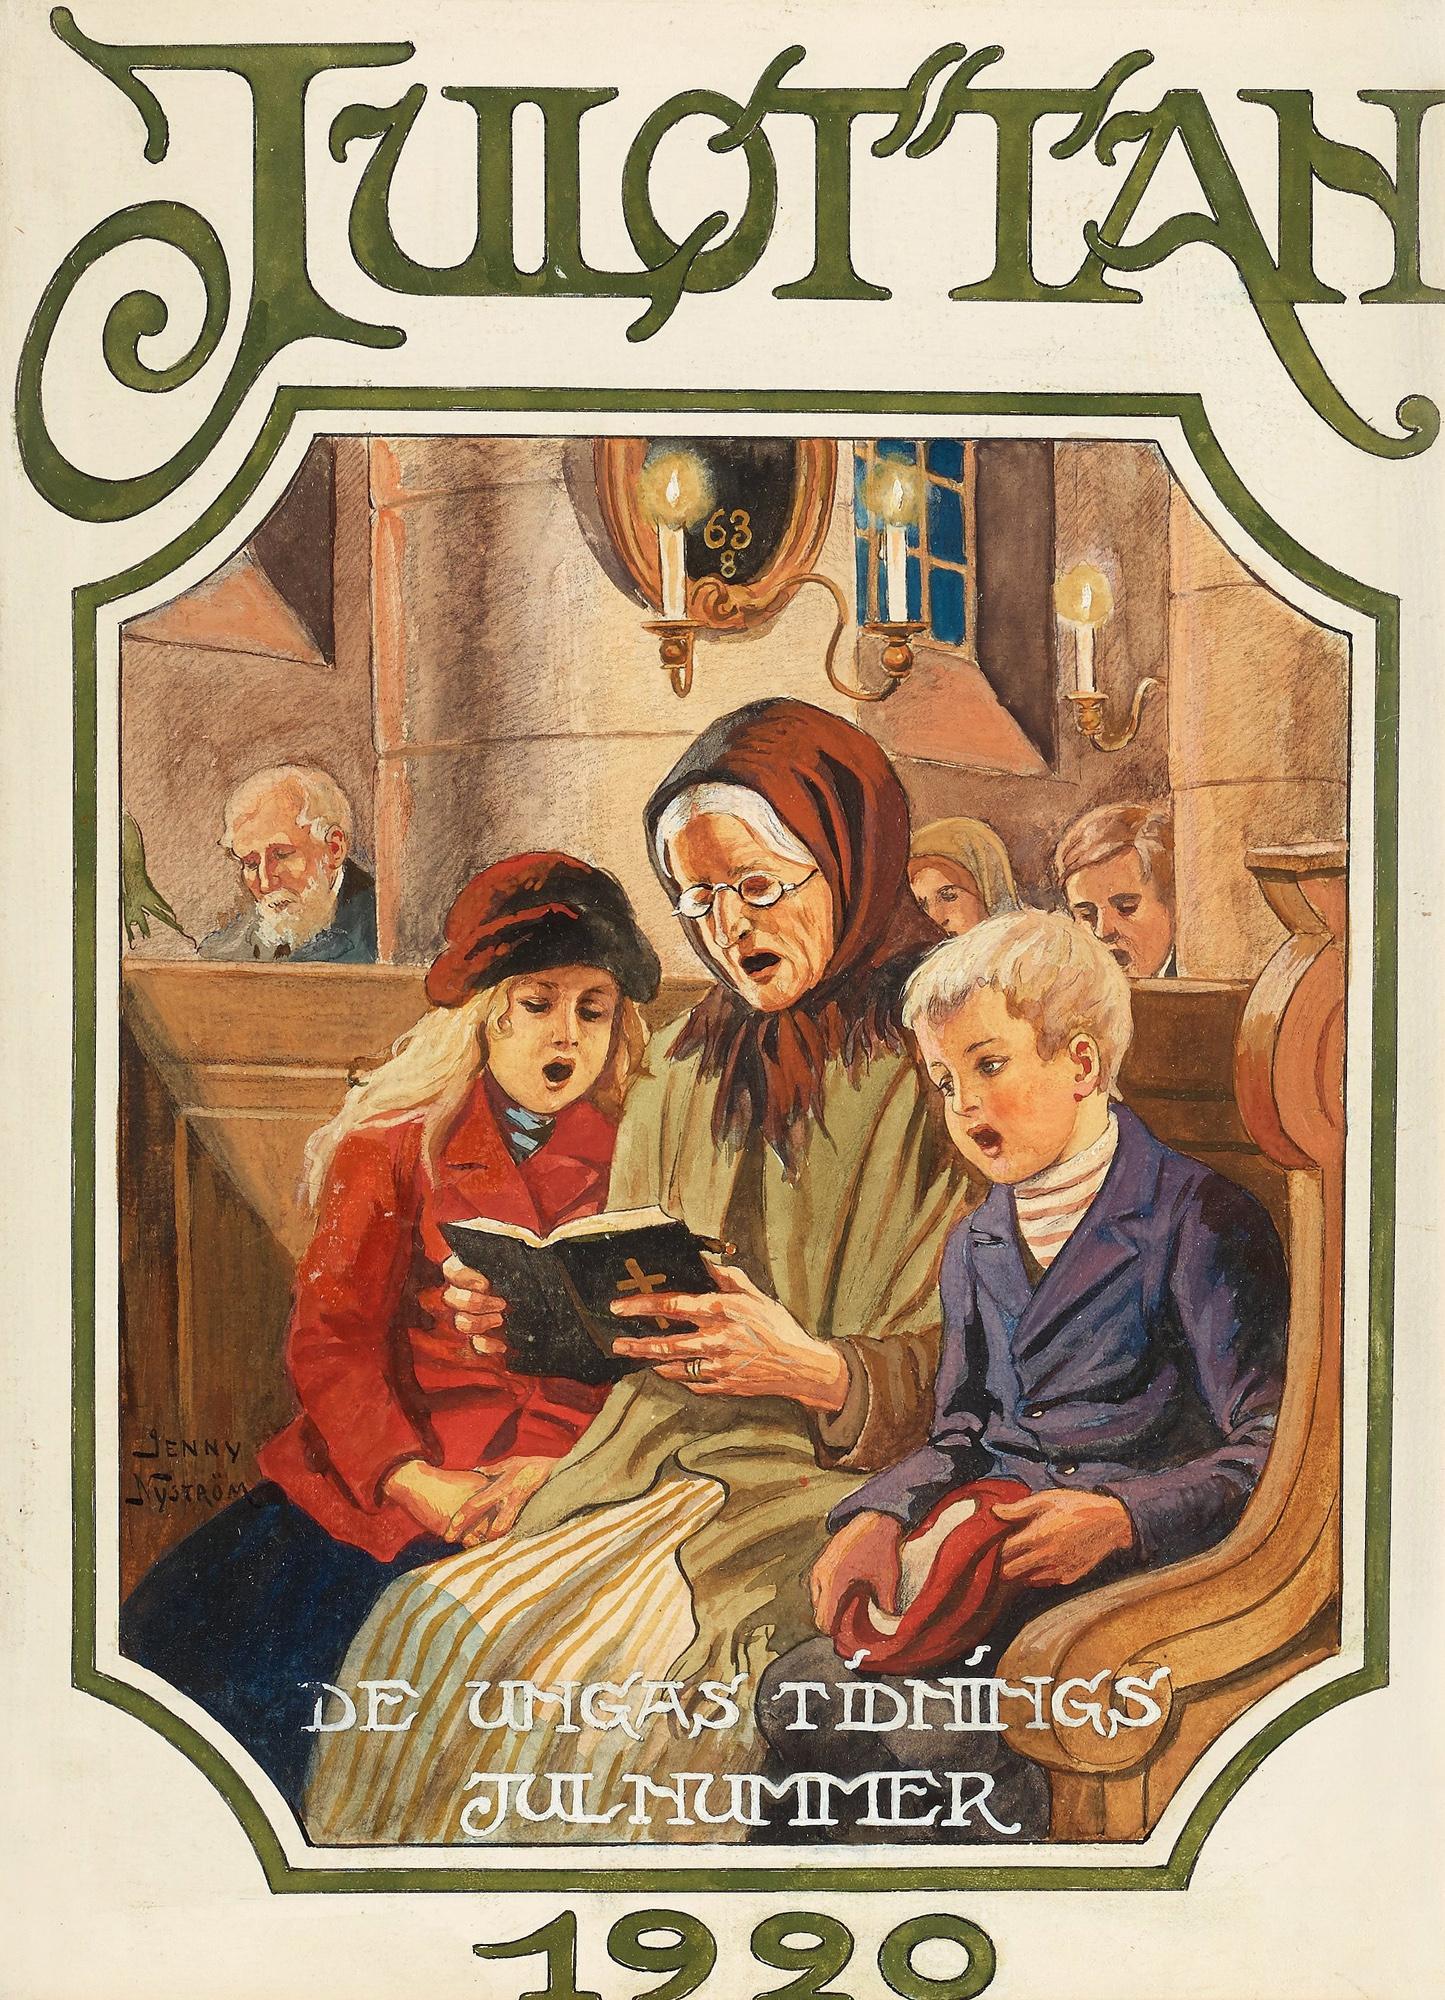 Julottan - Jenny Nystrom - 1920